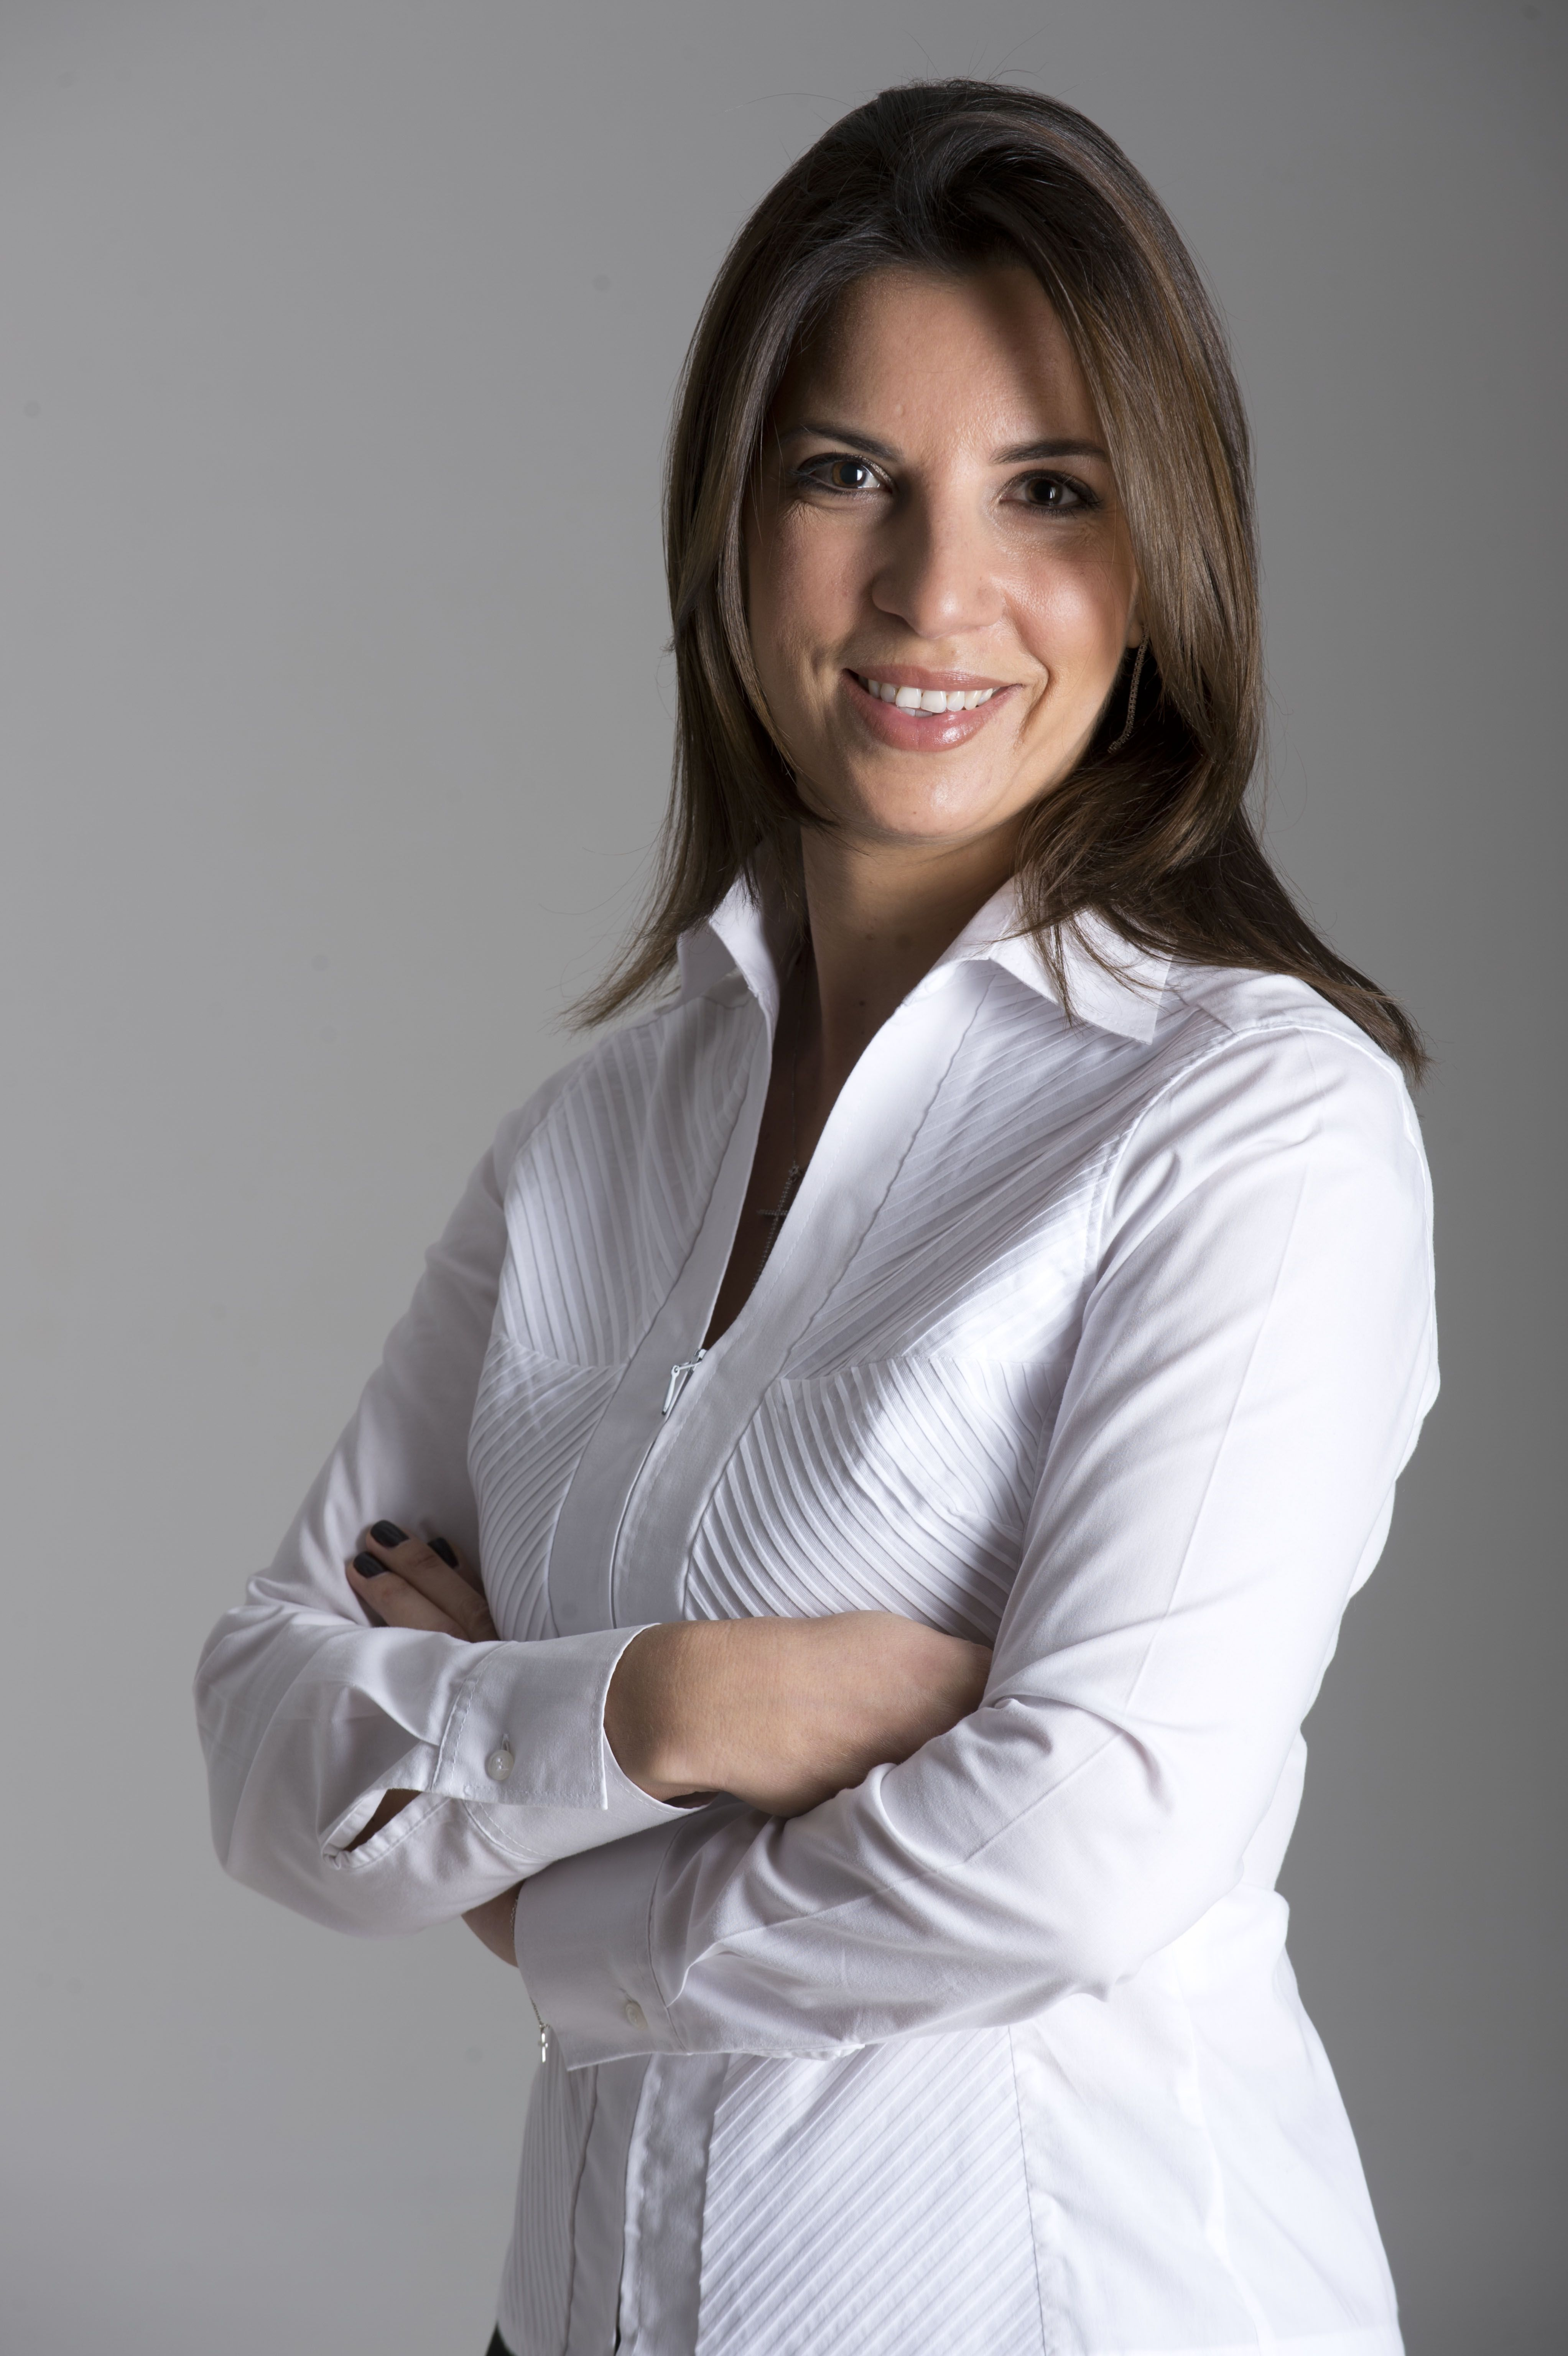 H Αργυρώ Καναβού είναι η δική σου beauty coach της Oriflame